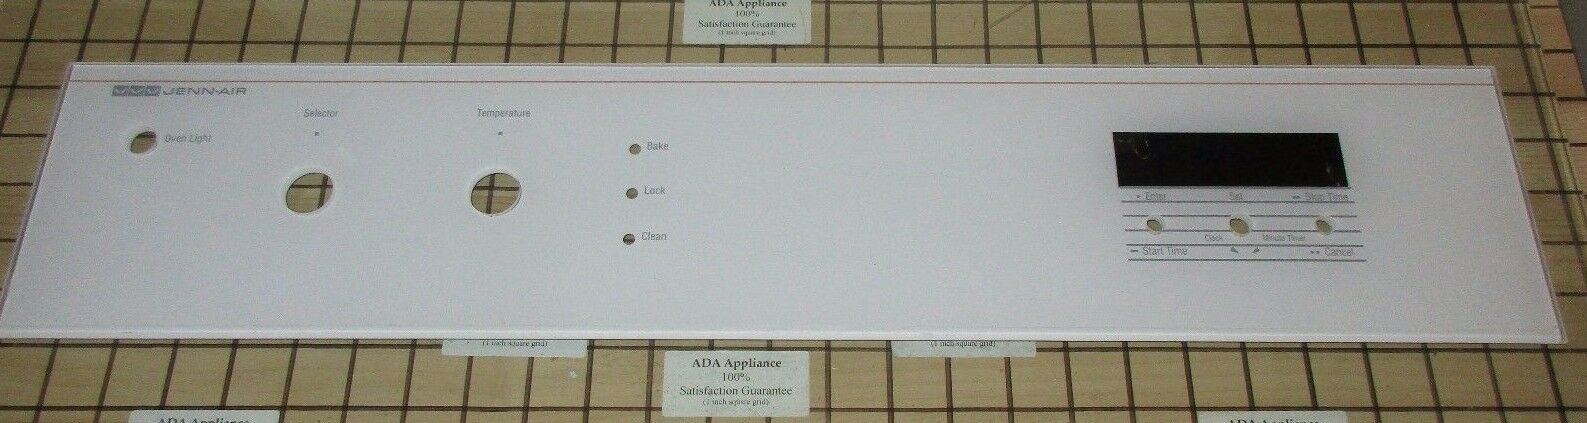 Jenn-Air / WP Glass Control  Panel Wht 705129 SATFACTION GUAR & FREE EXP SHIP